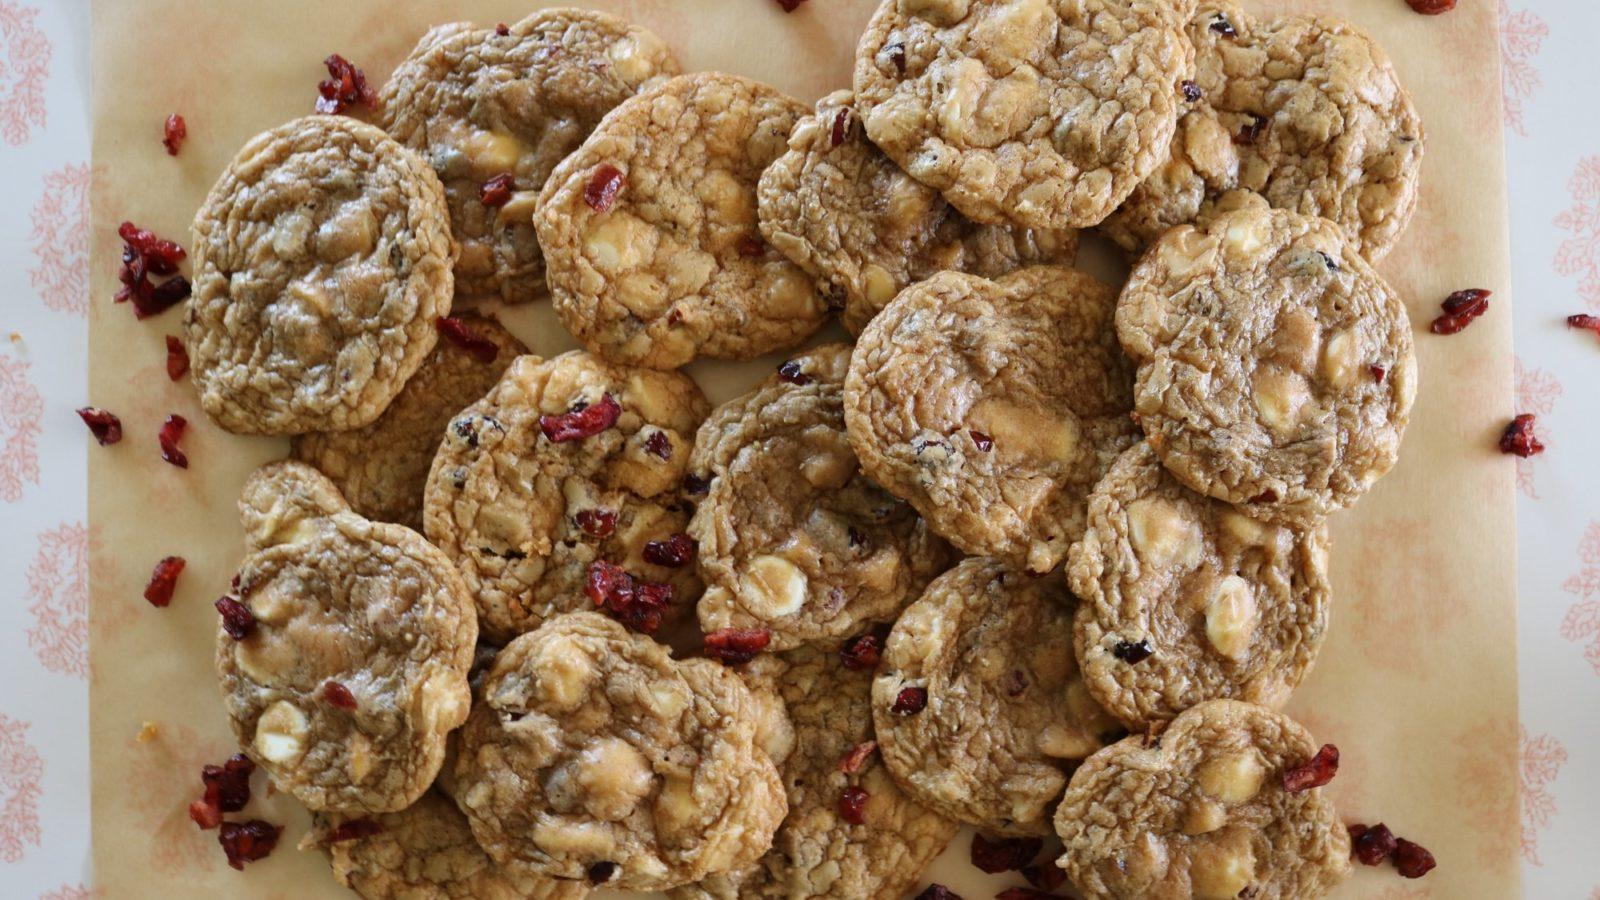 Cranberry, White Chocolate Chip and Macadamia Cookie Recipe 2